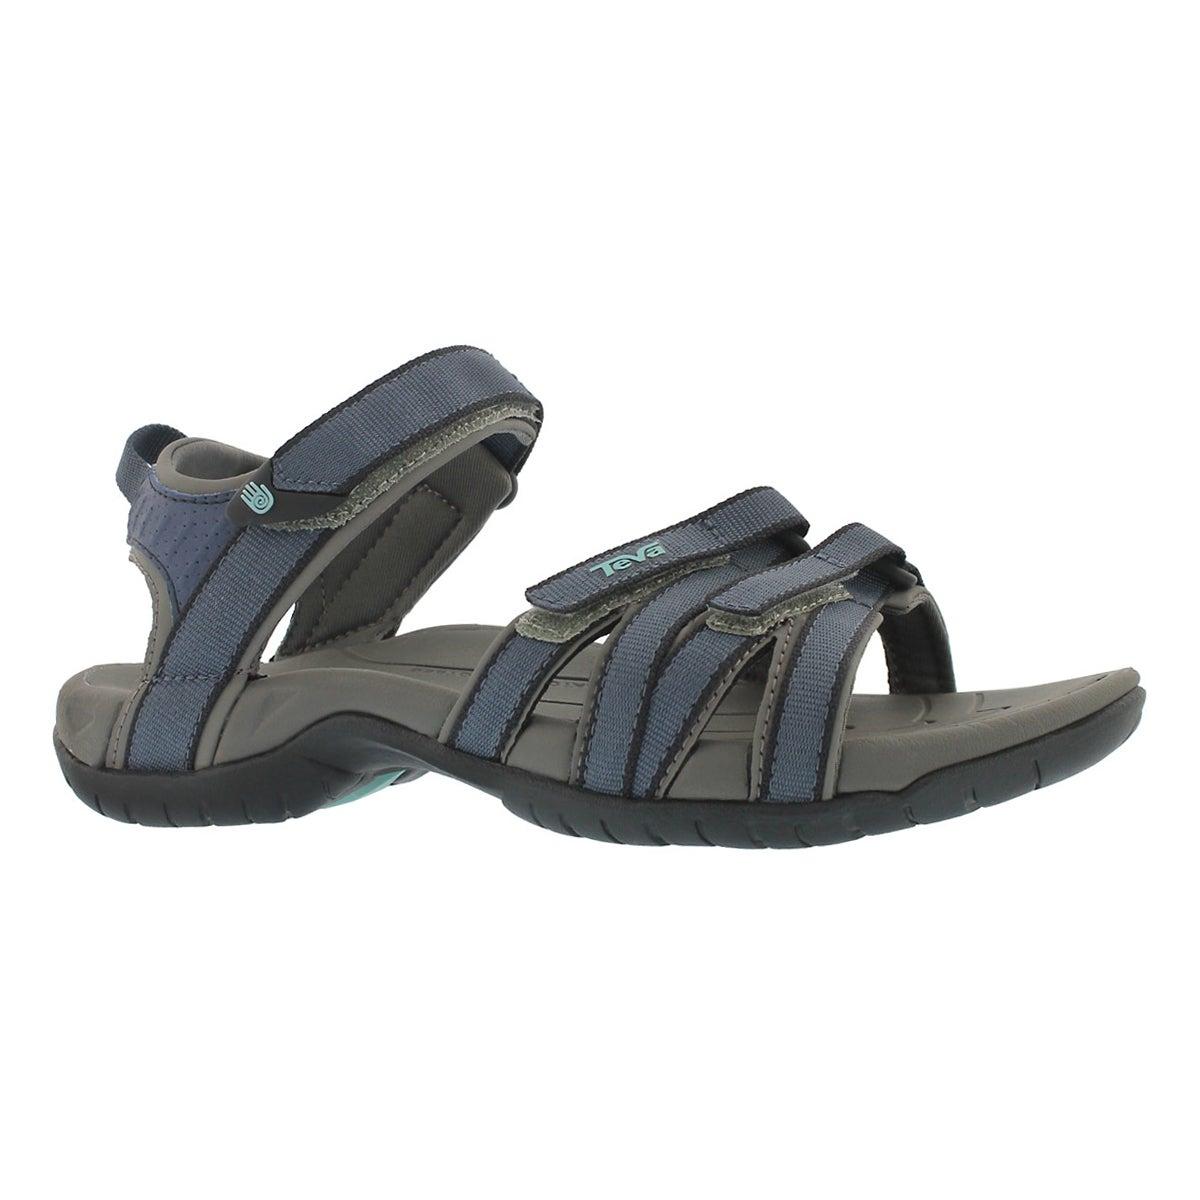 Women's TIRRA bering sea sport sandals